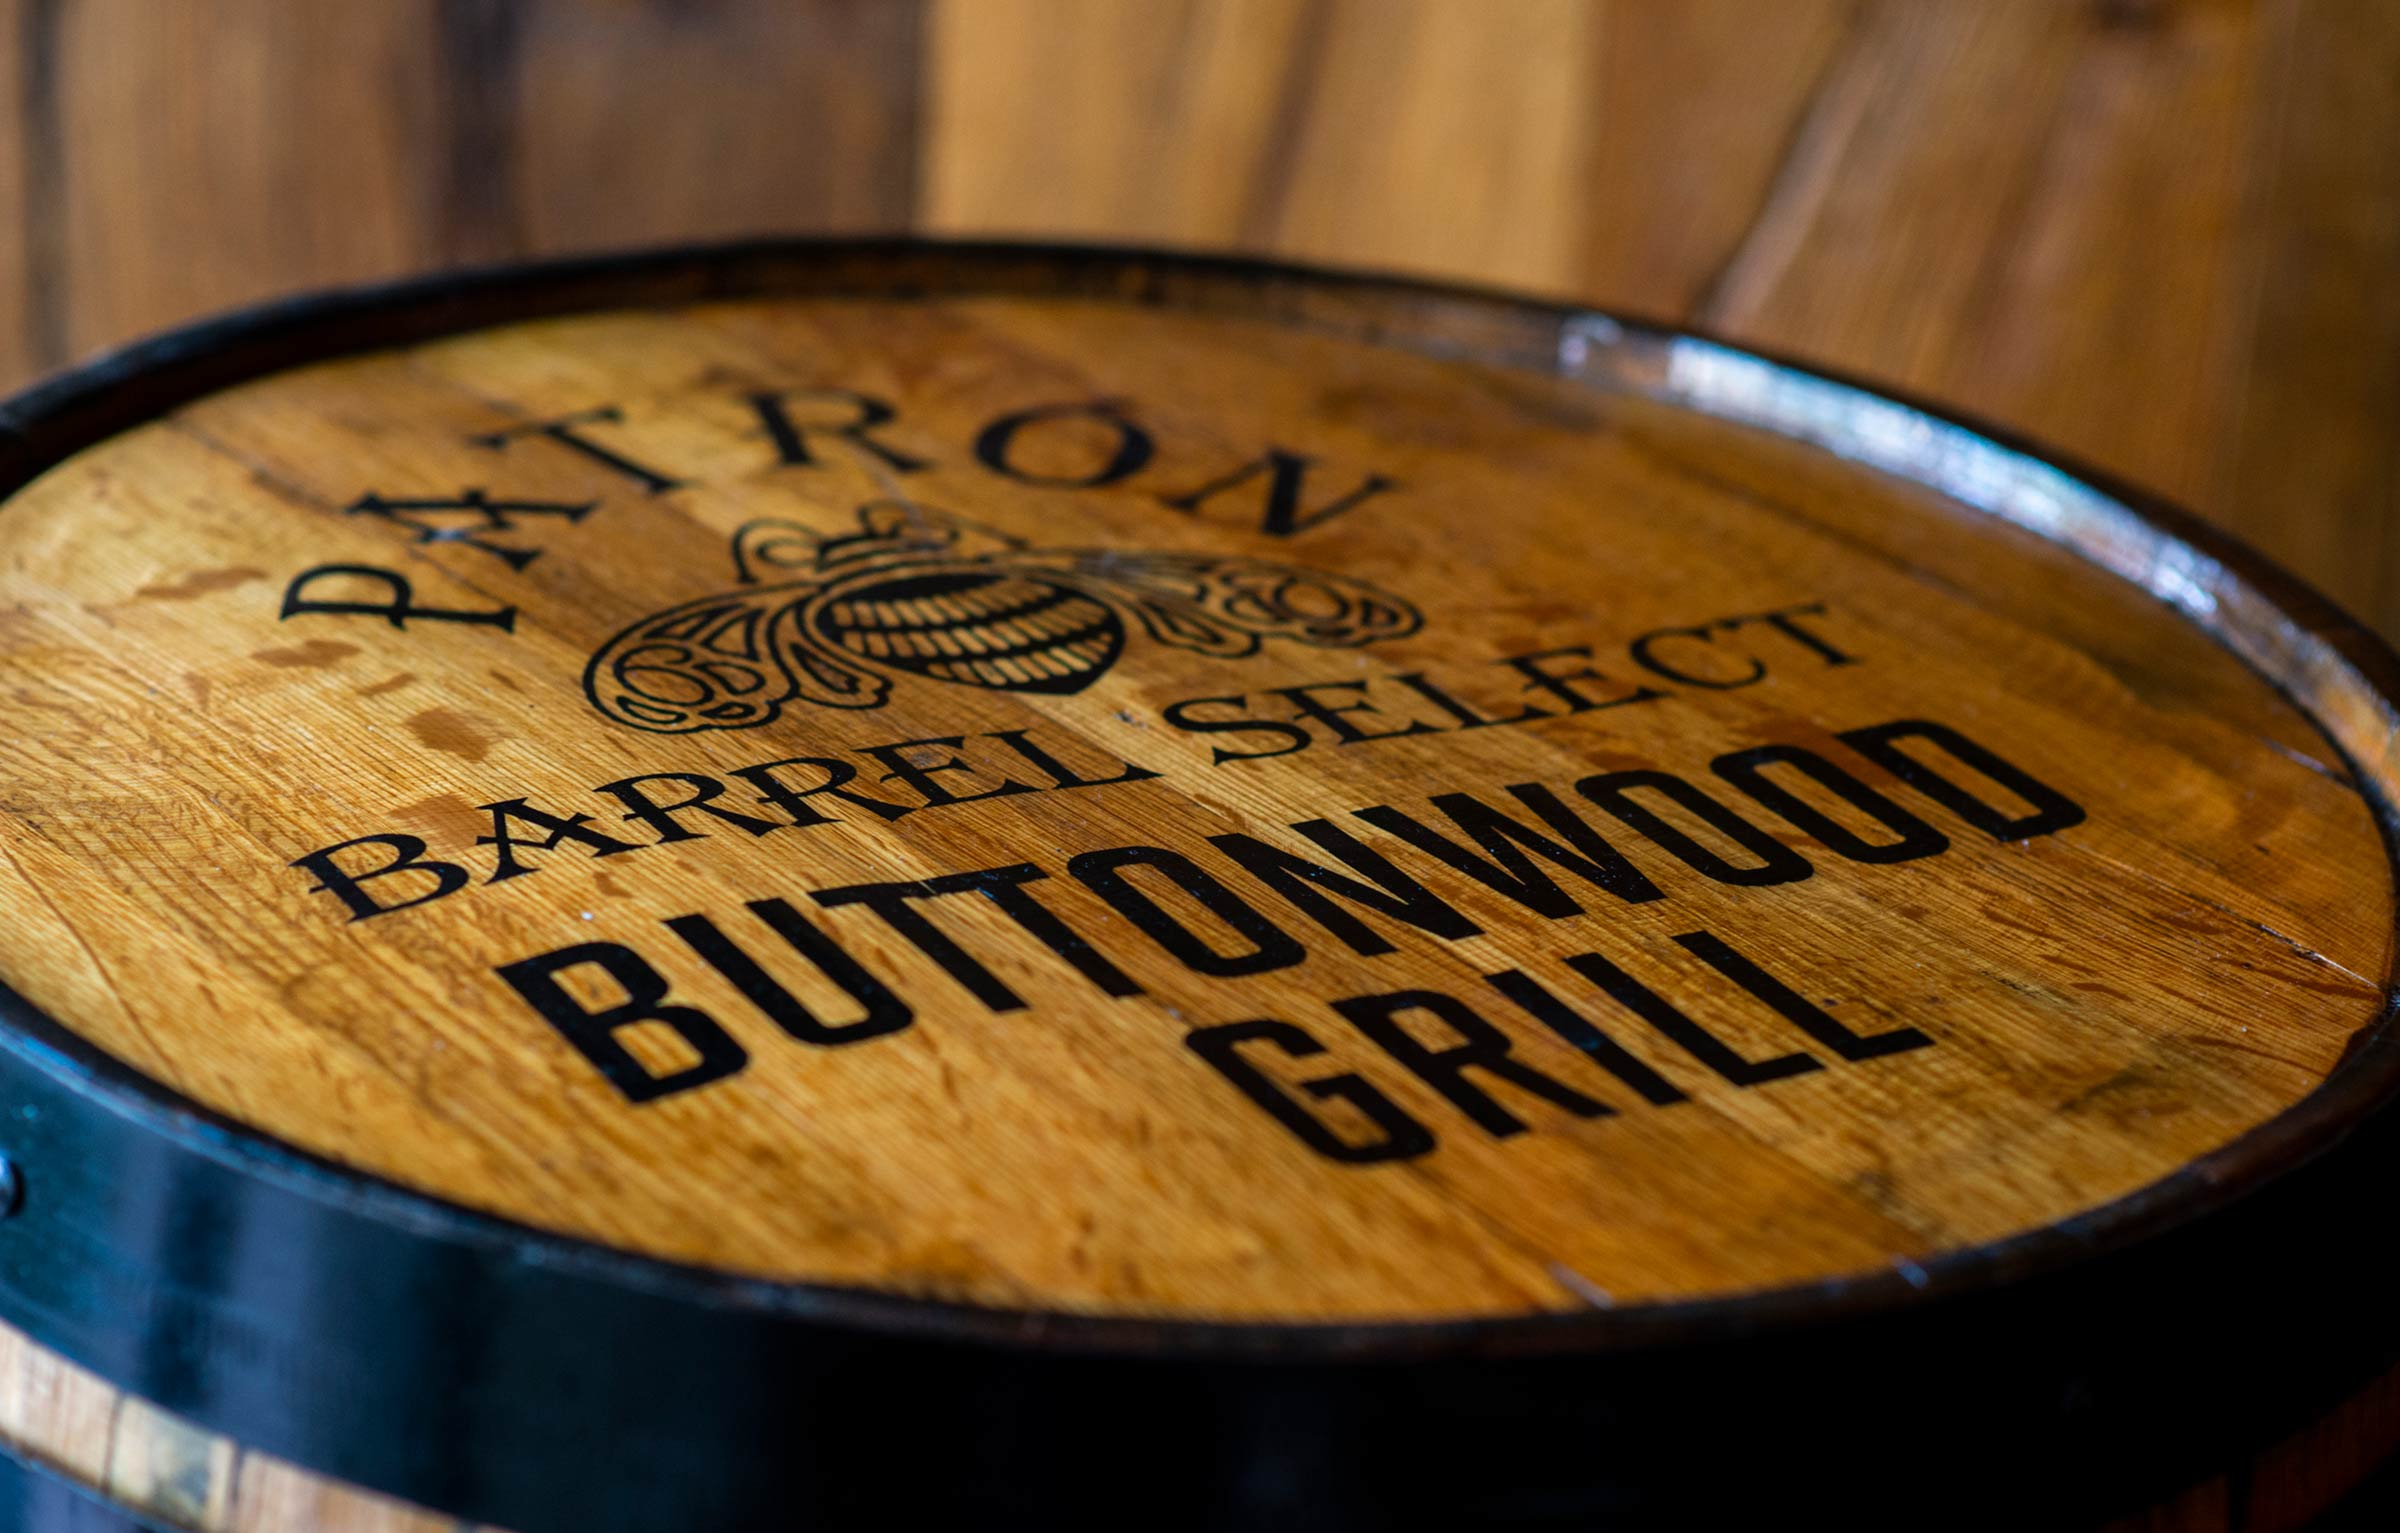 Buttonwood grill beer casket